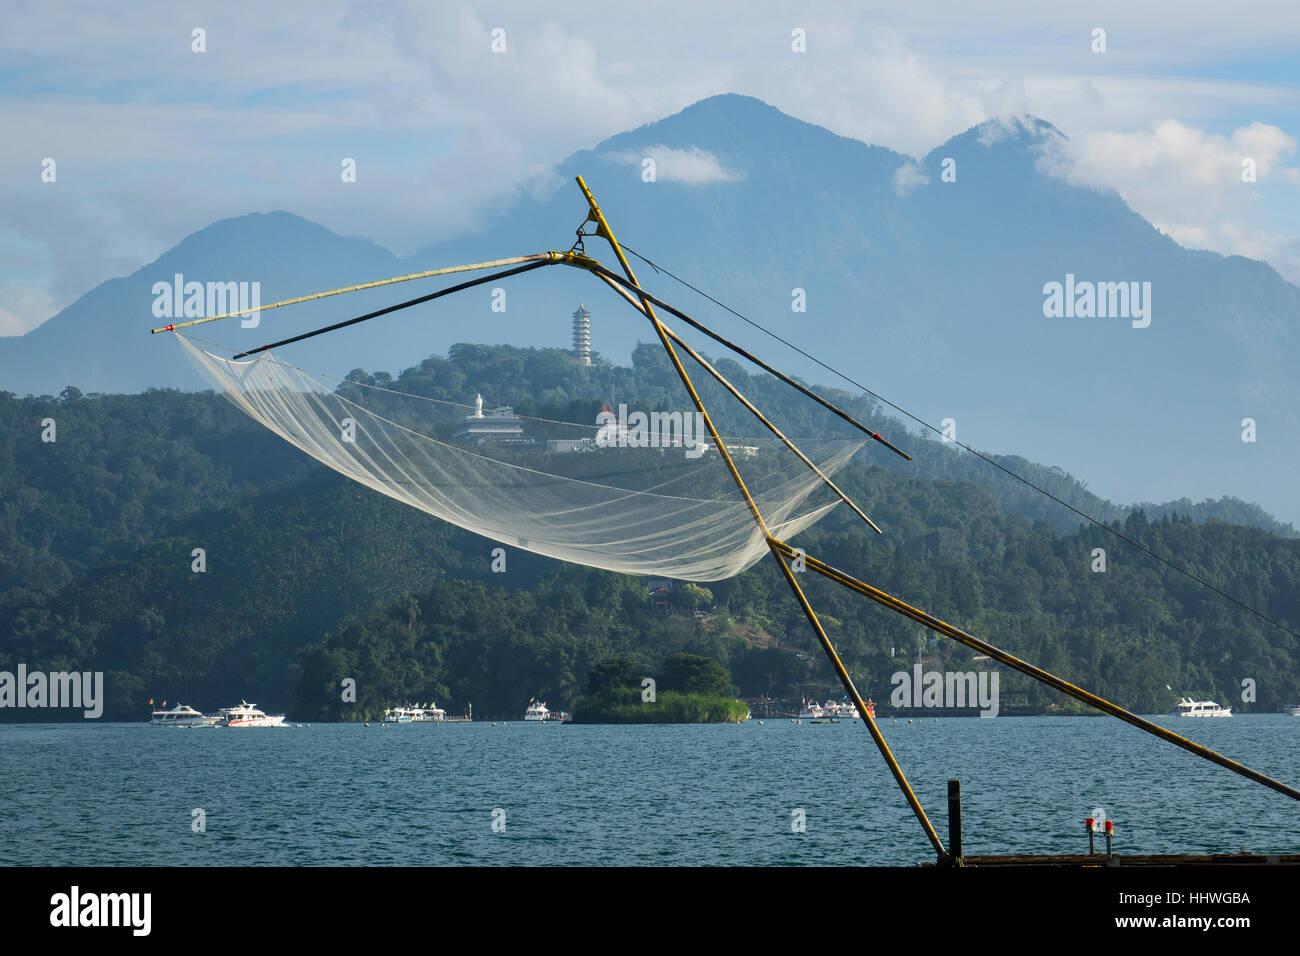 Taiwan, Sun Moon lake, Fishing net & distant Ci-en Pagoda - Stock Image